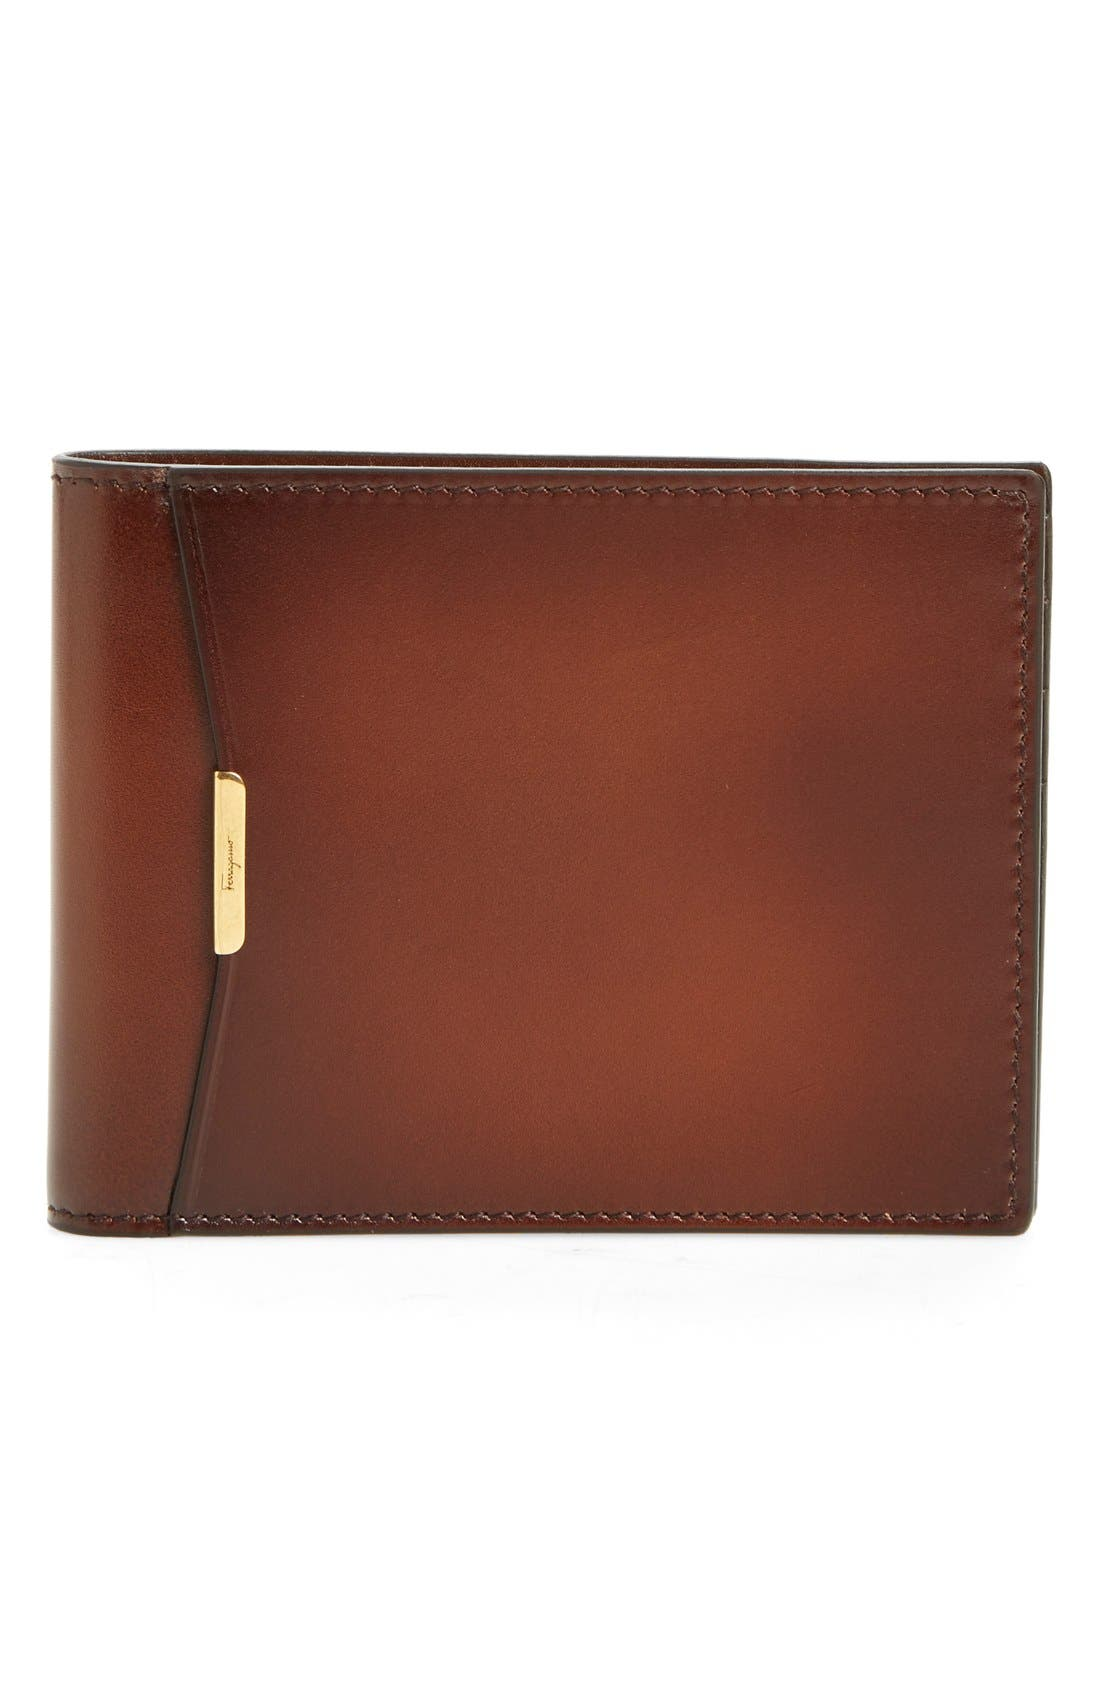 Main Image - Salvatore Ferragamo Bifold Leather Wallet